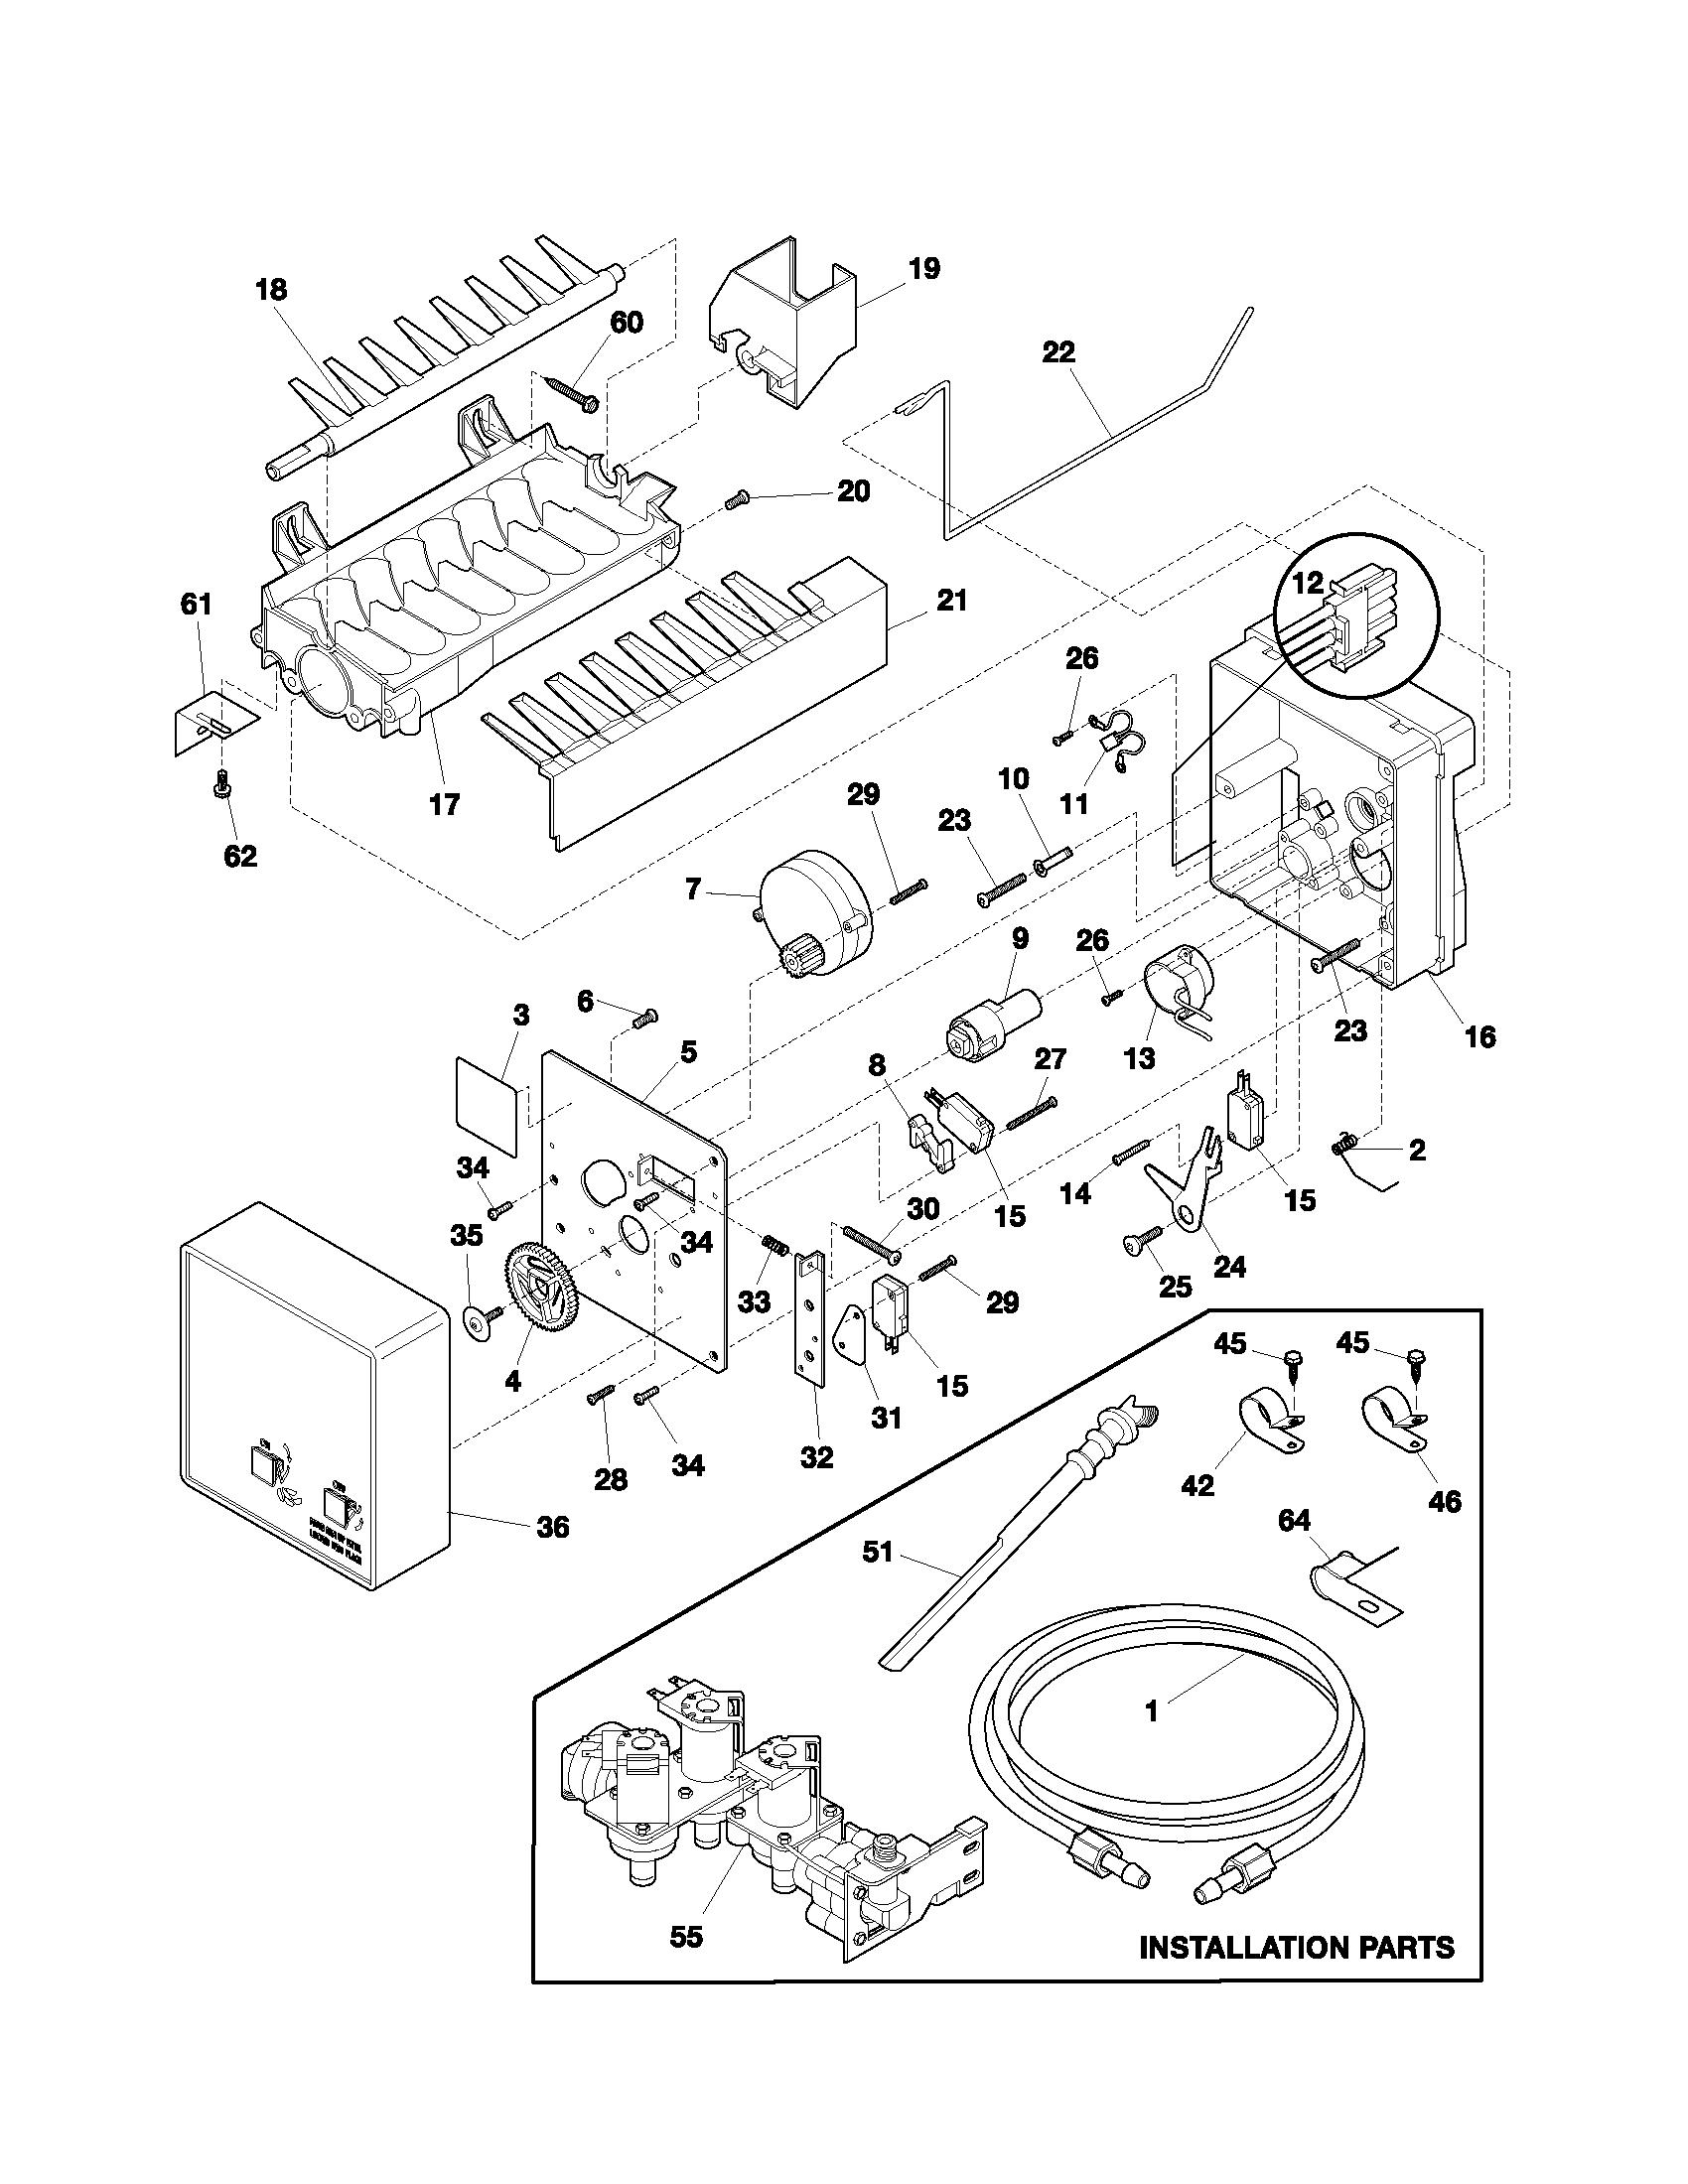 frigidaire refrigerator parts diagram